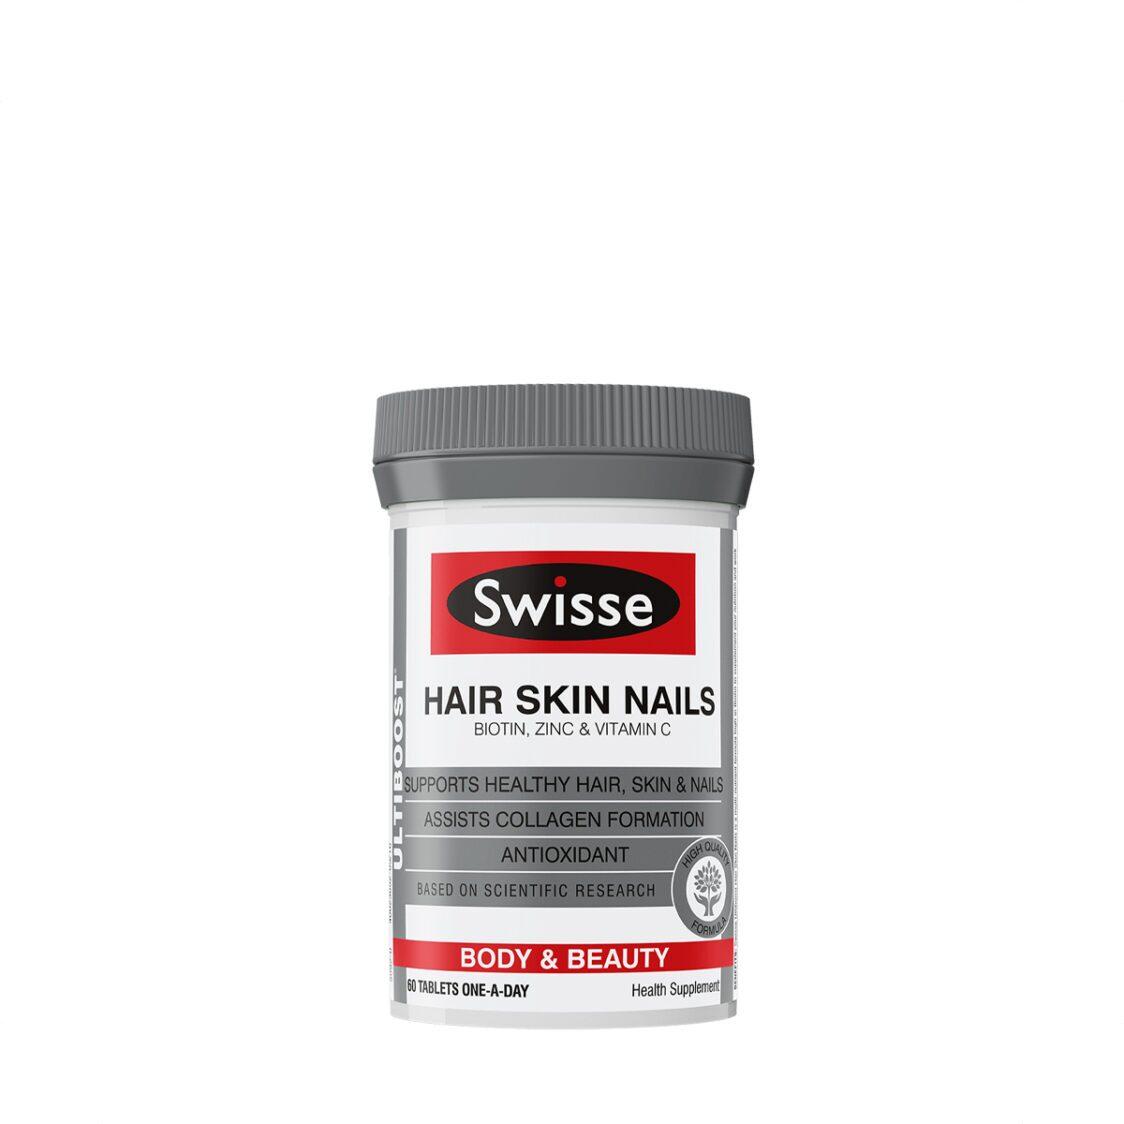 Swisse Ultiboost Hair Skin Nails 60s